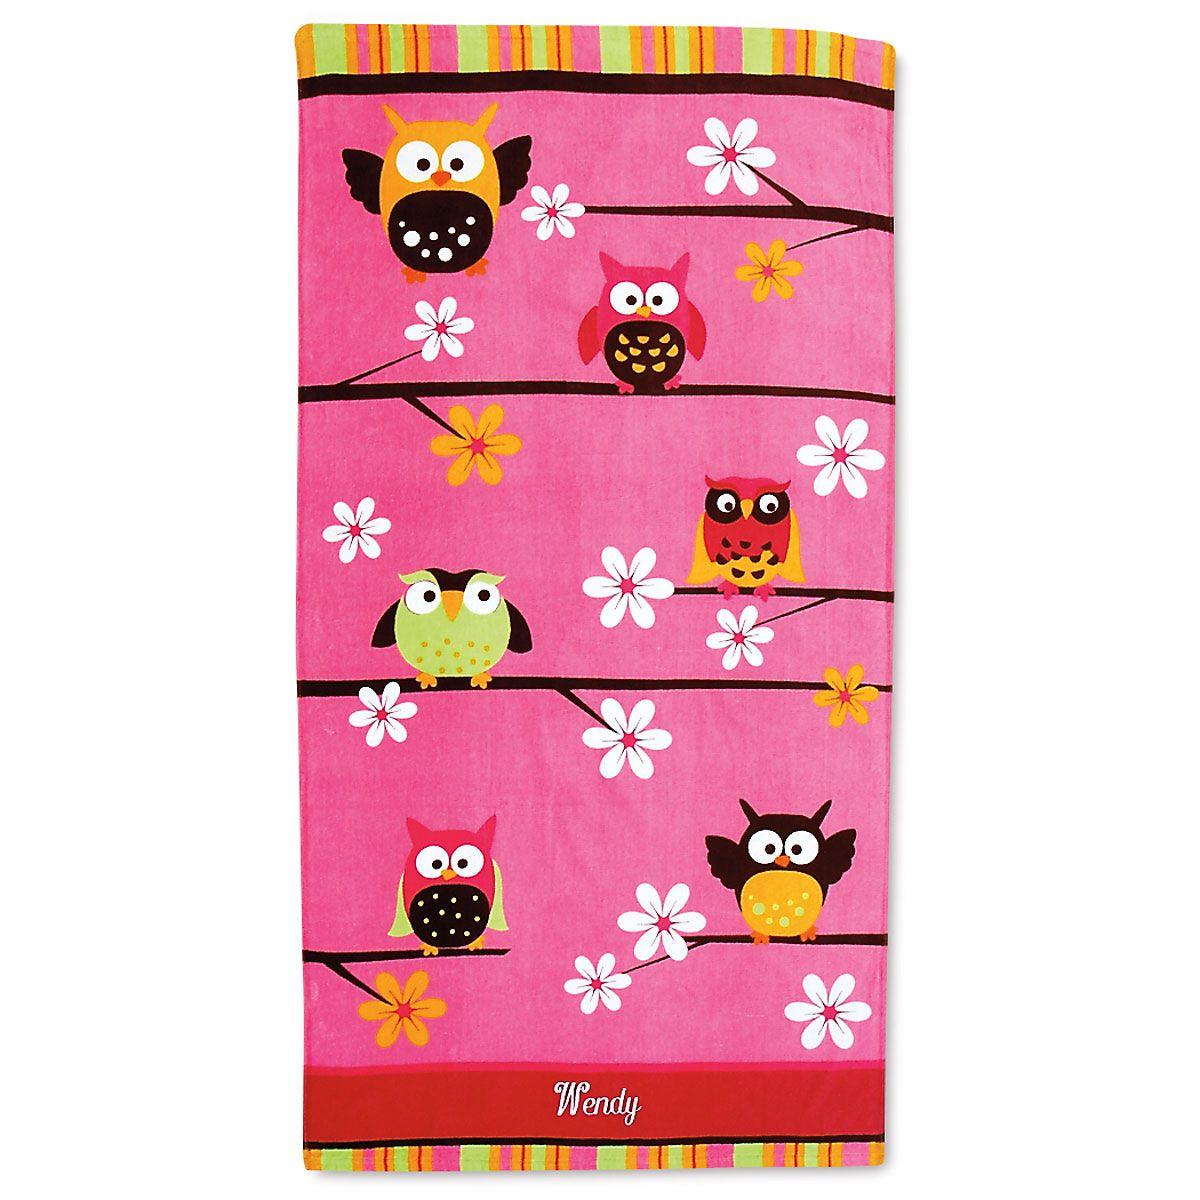 Owl Beach Personalized Towel